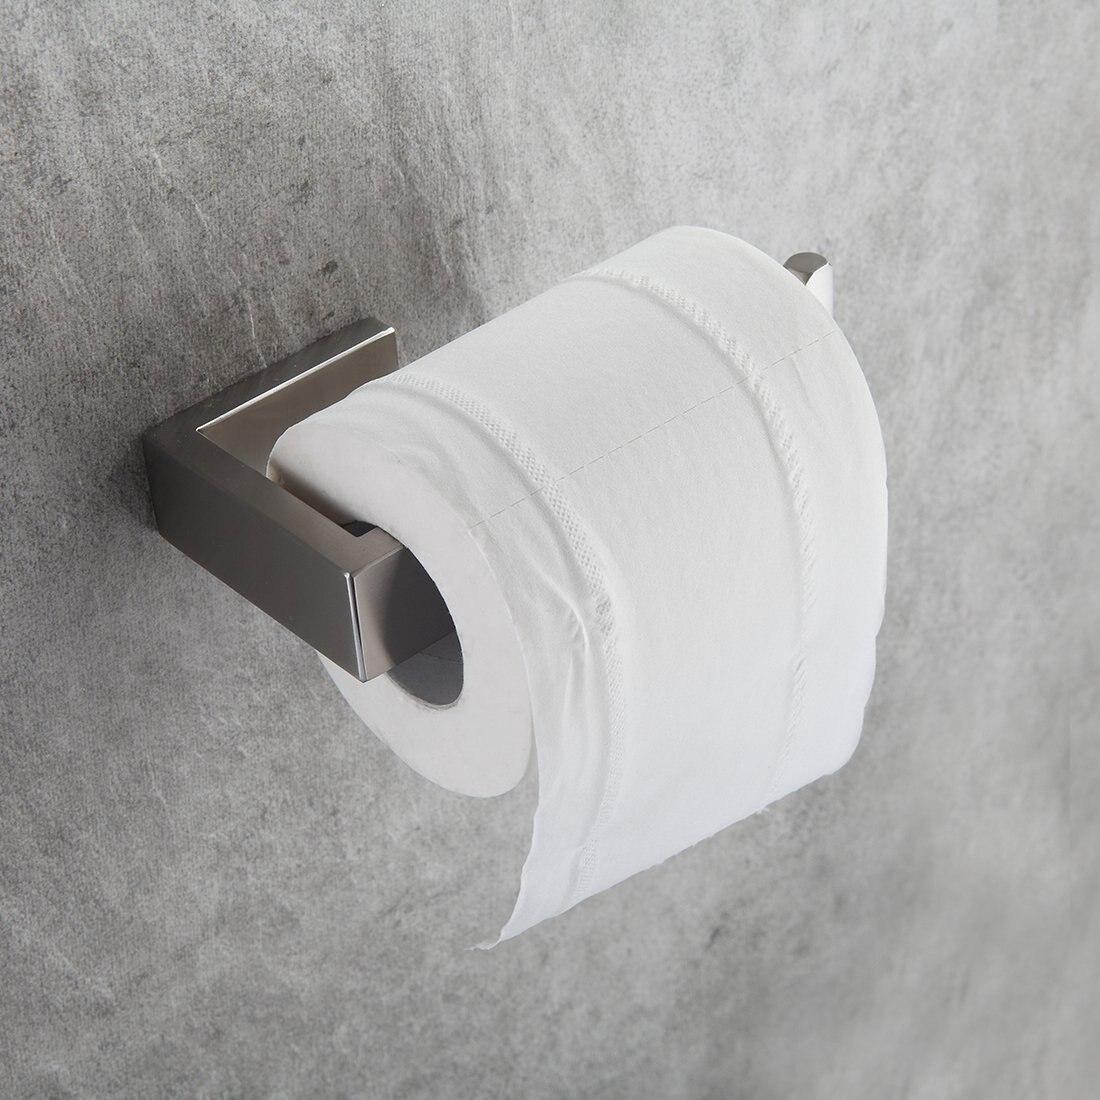 Fapully 4Piece Sets Bathroom Accessories Bath Hardware Sets 304 Stainless Steel Set Single Towel Bar Robe Hook Paper Holder G124